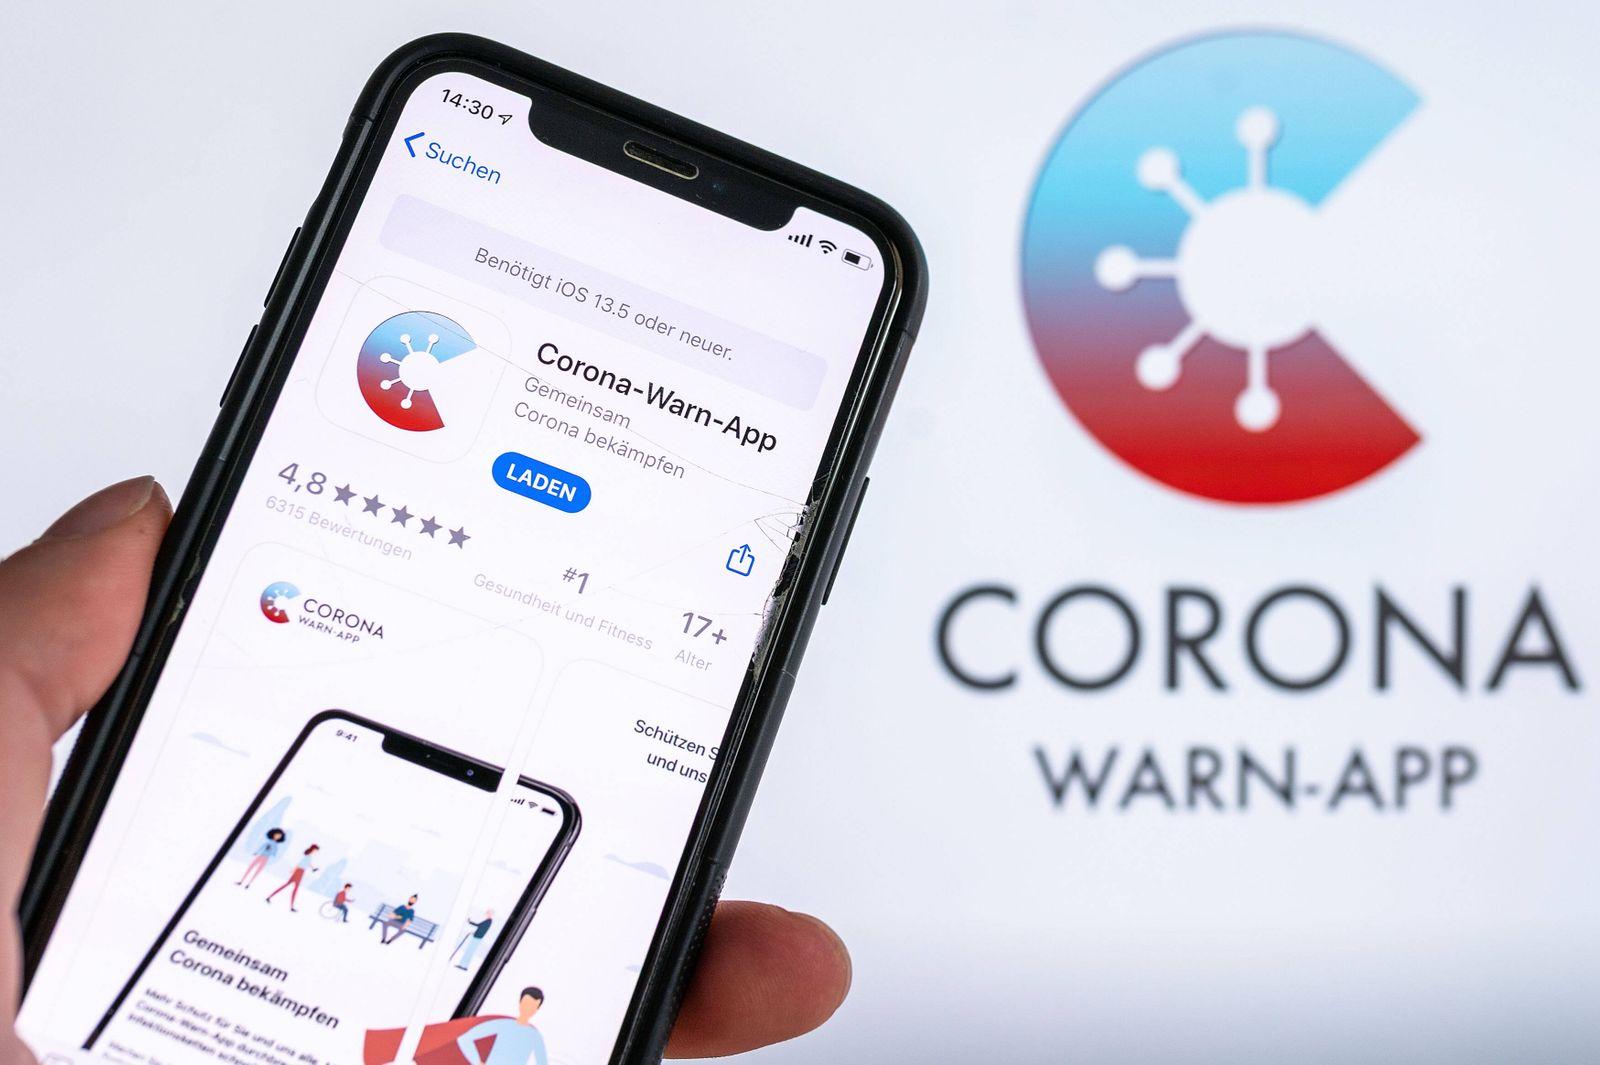 16.06.2020, xfux, Politik Medizin, Corona Warn App in Berlin vorgestellt, emwirt empoli emlahe, v.l. Die Corona Warn App